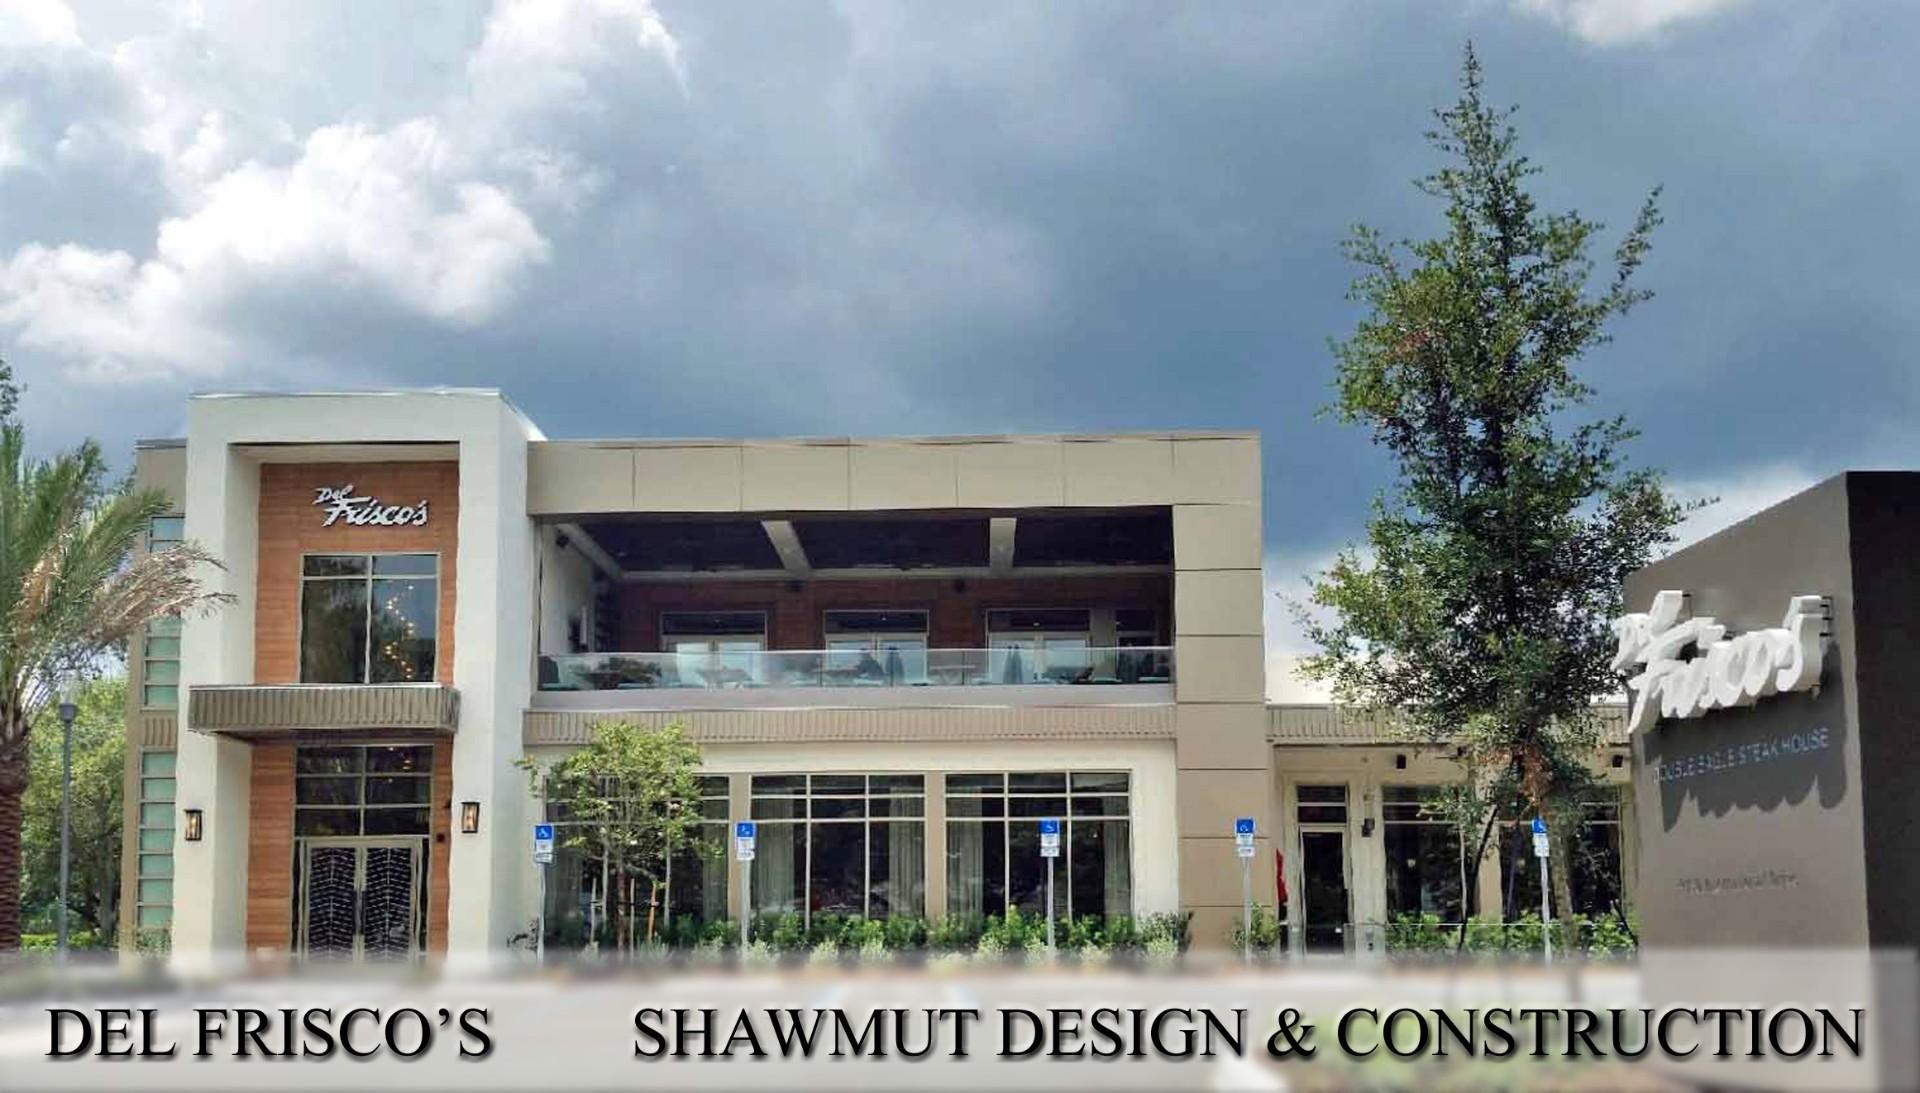 Del Frisco's - Shawmut Design and Construction